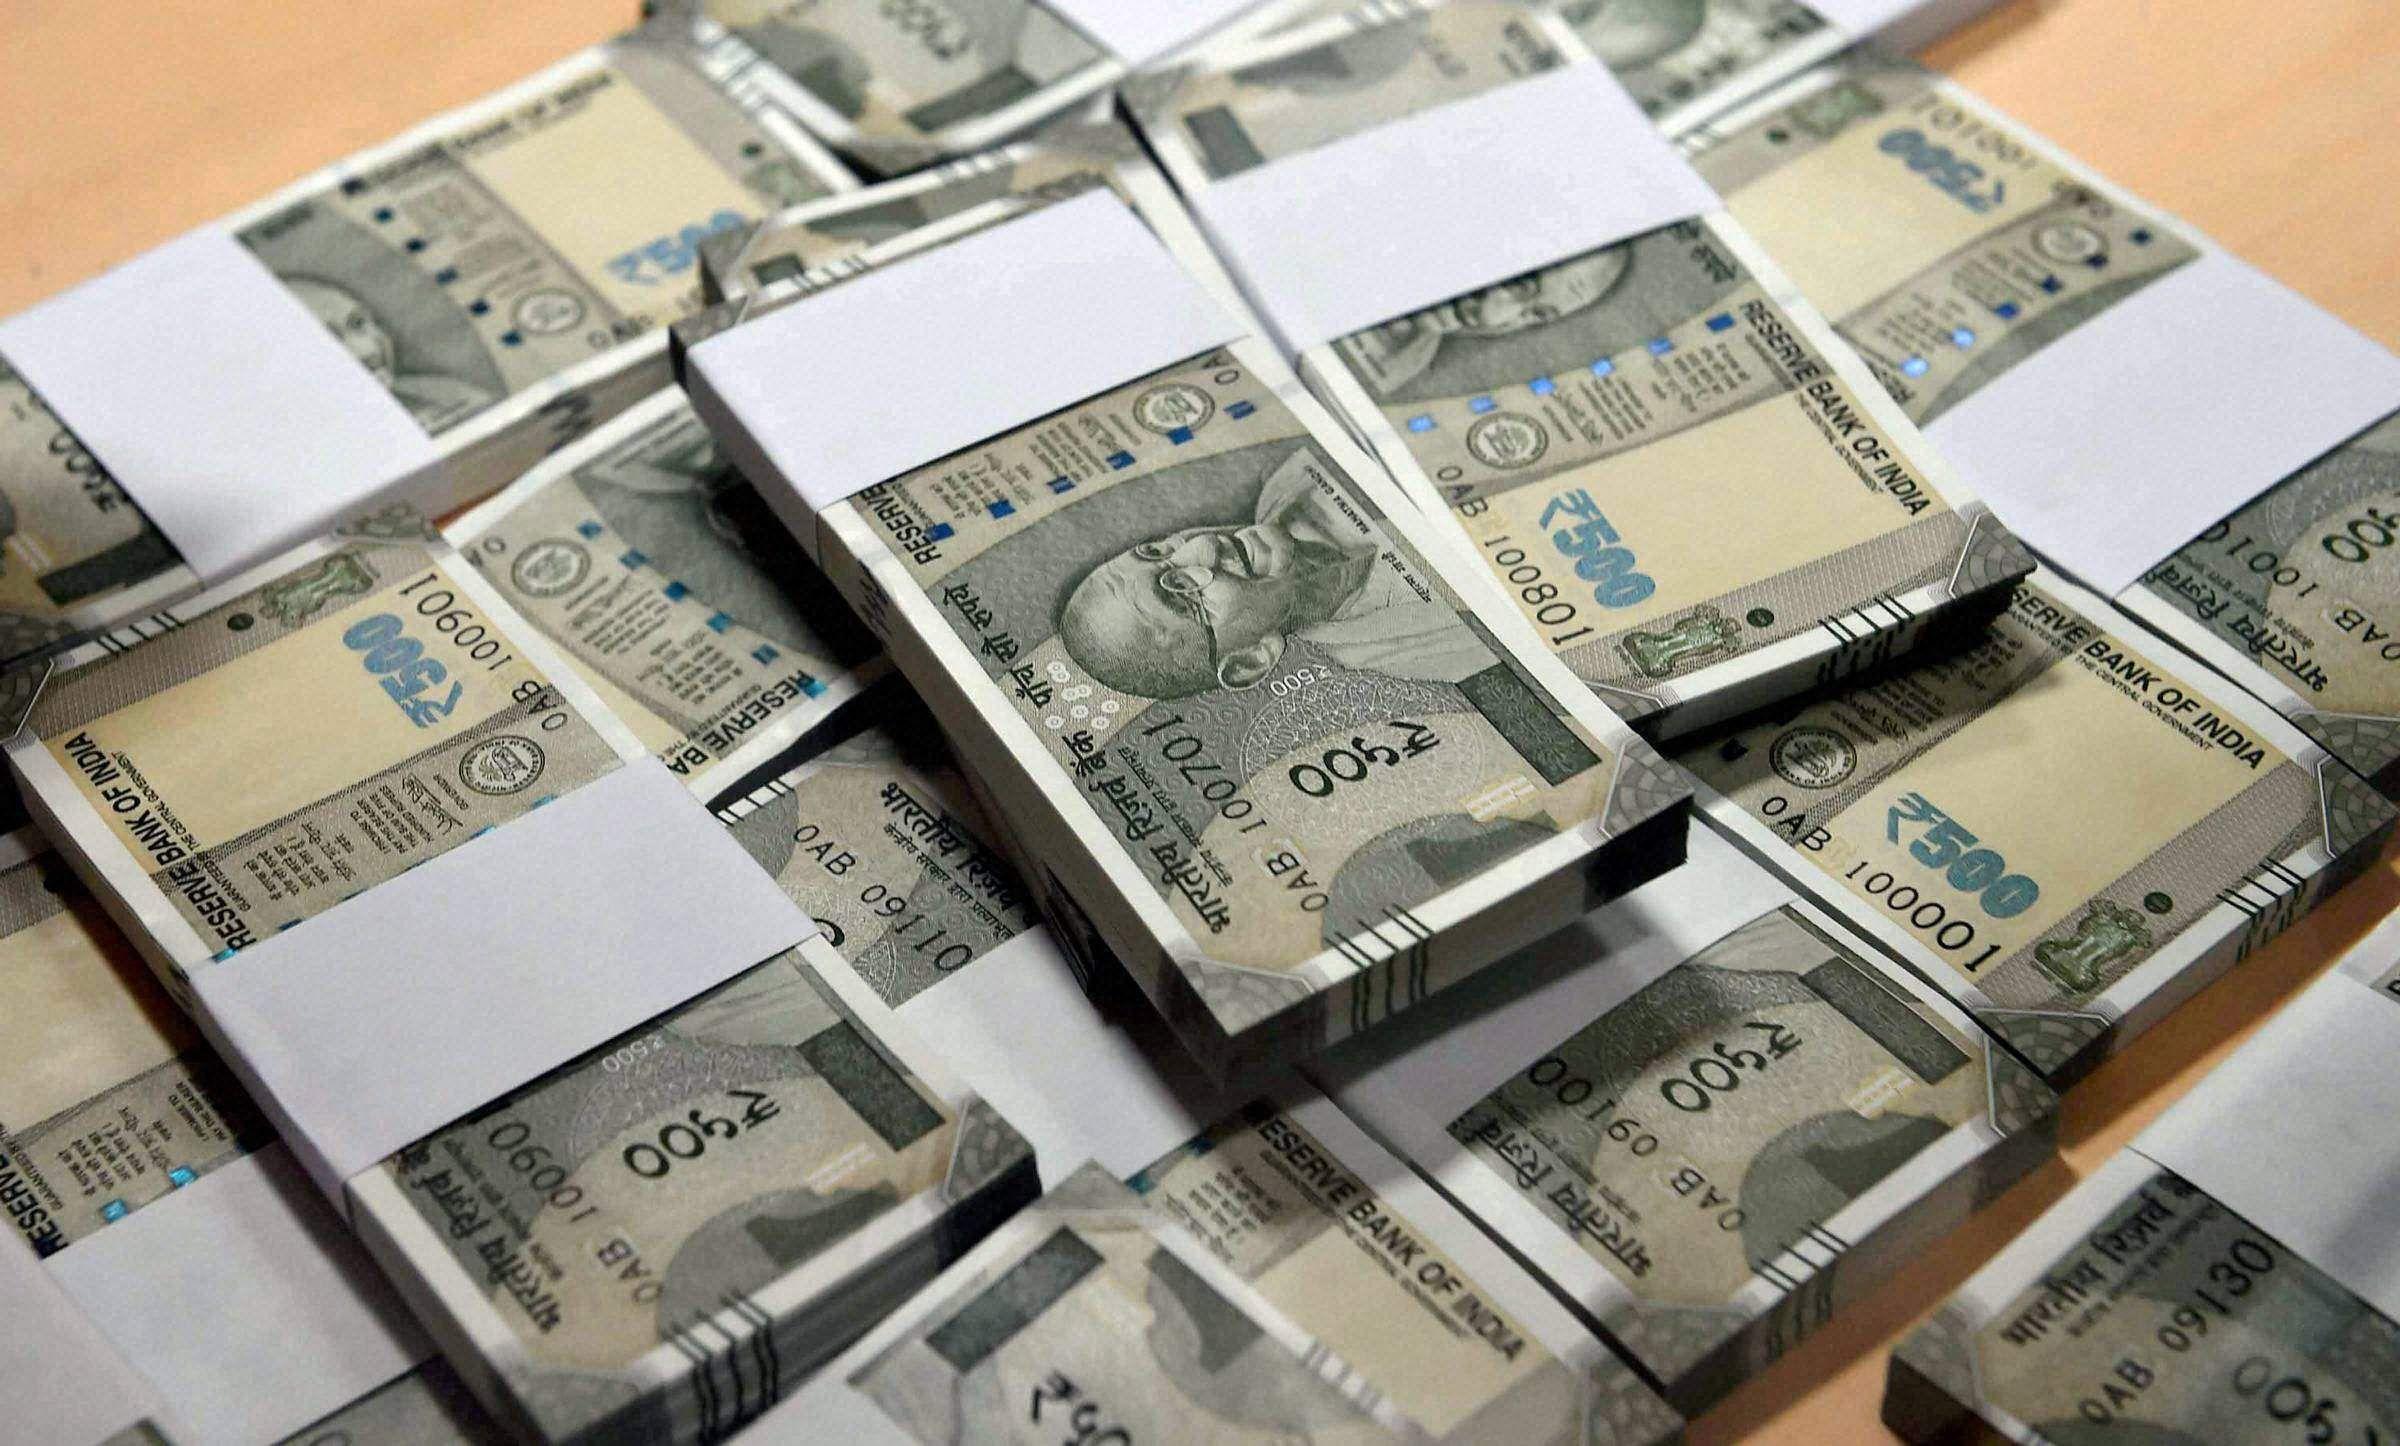 Pournami Rn 379 Lottery Kerala Lottery 17 02 2019 Results Personal Loans Money Cash Loans